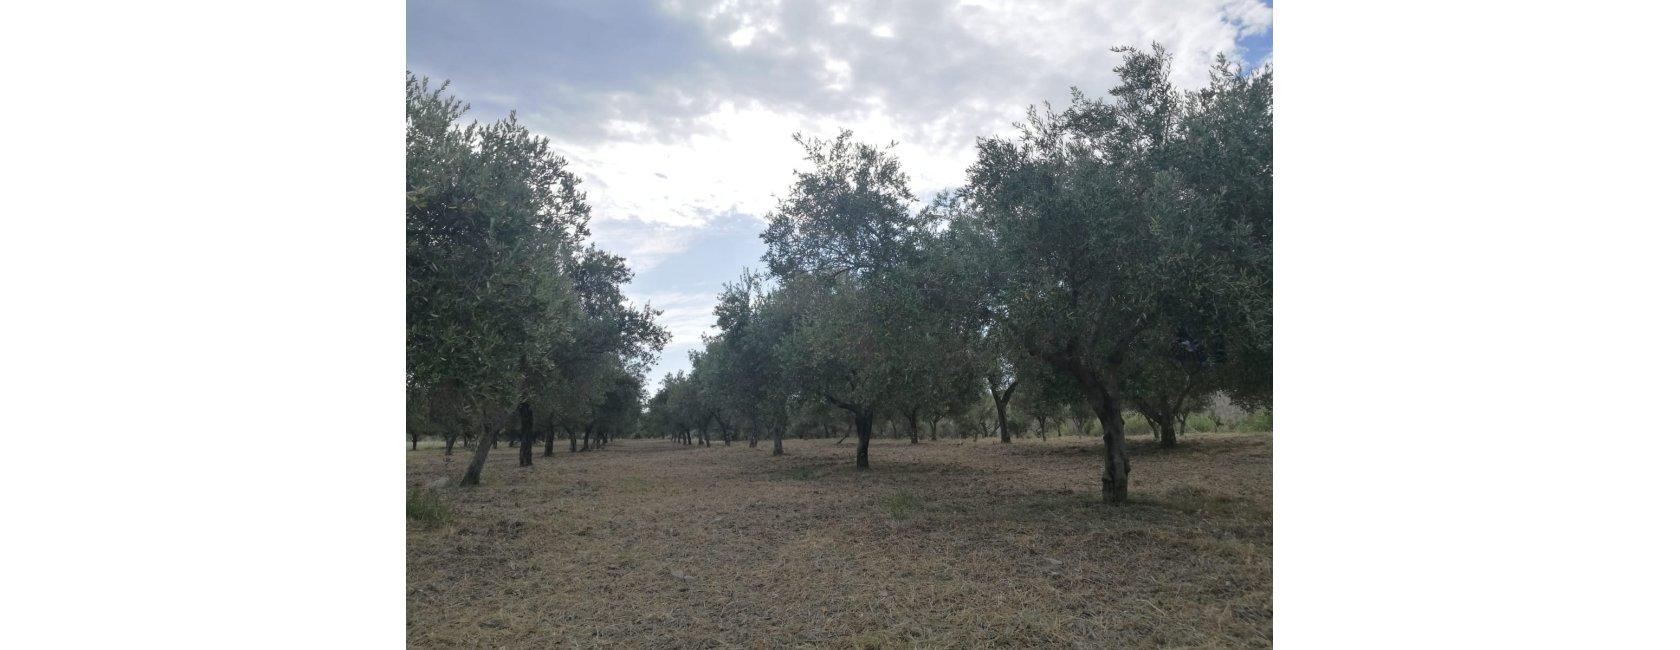 Agraria Gallelli